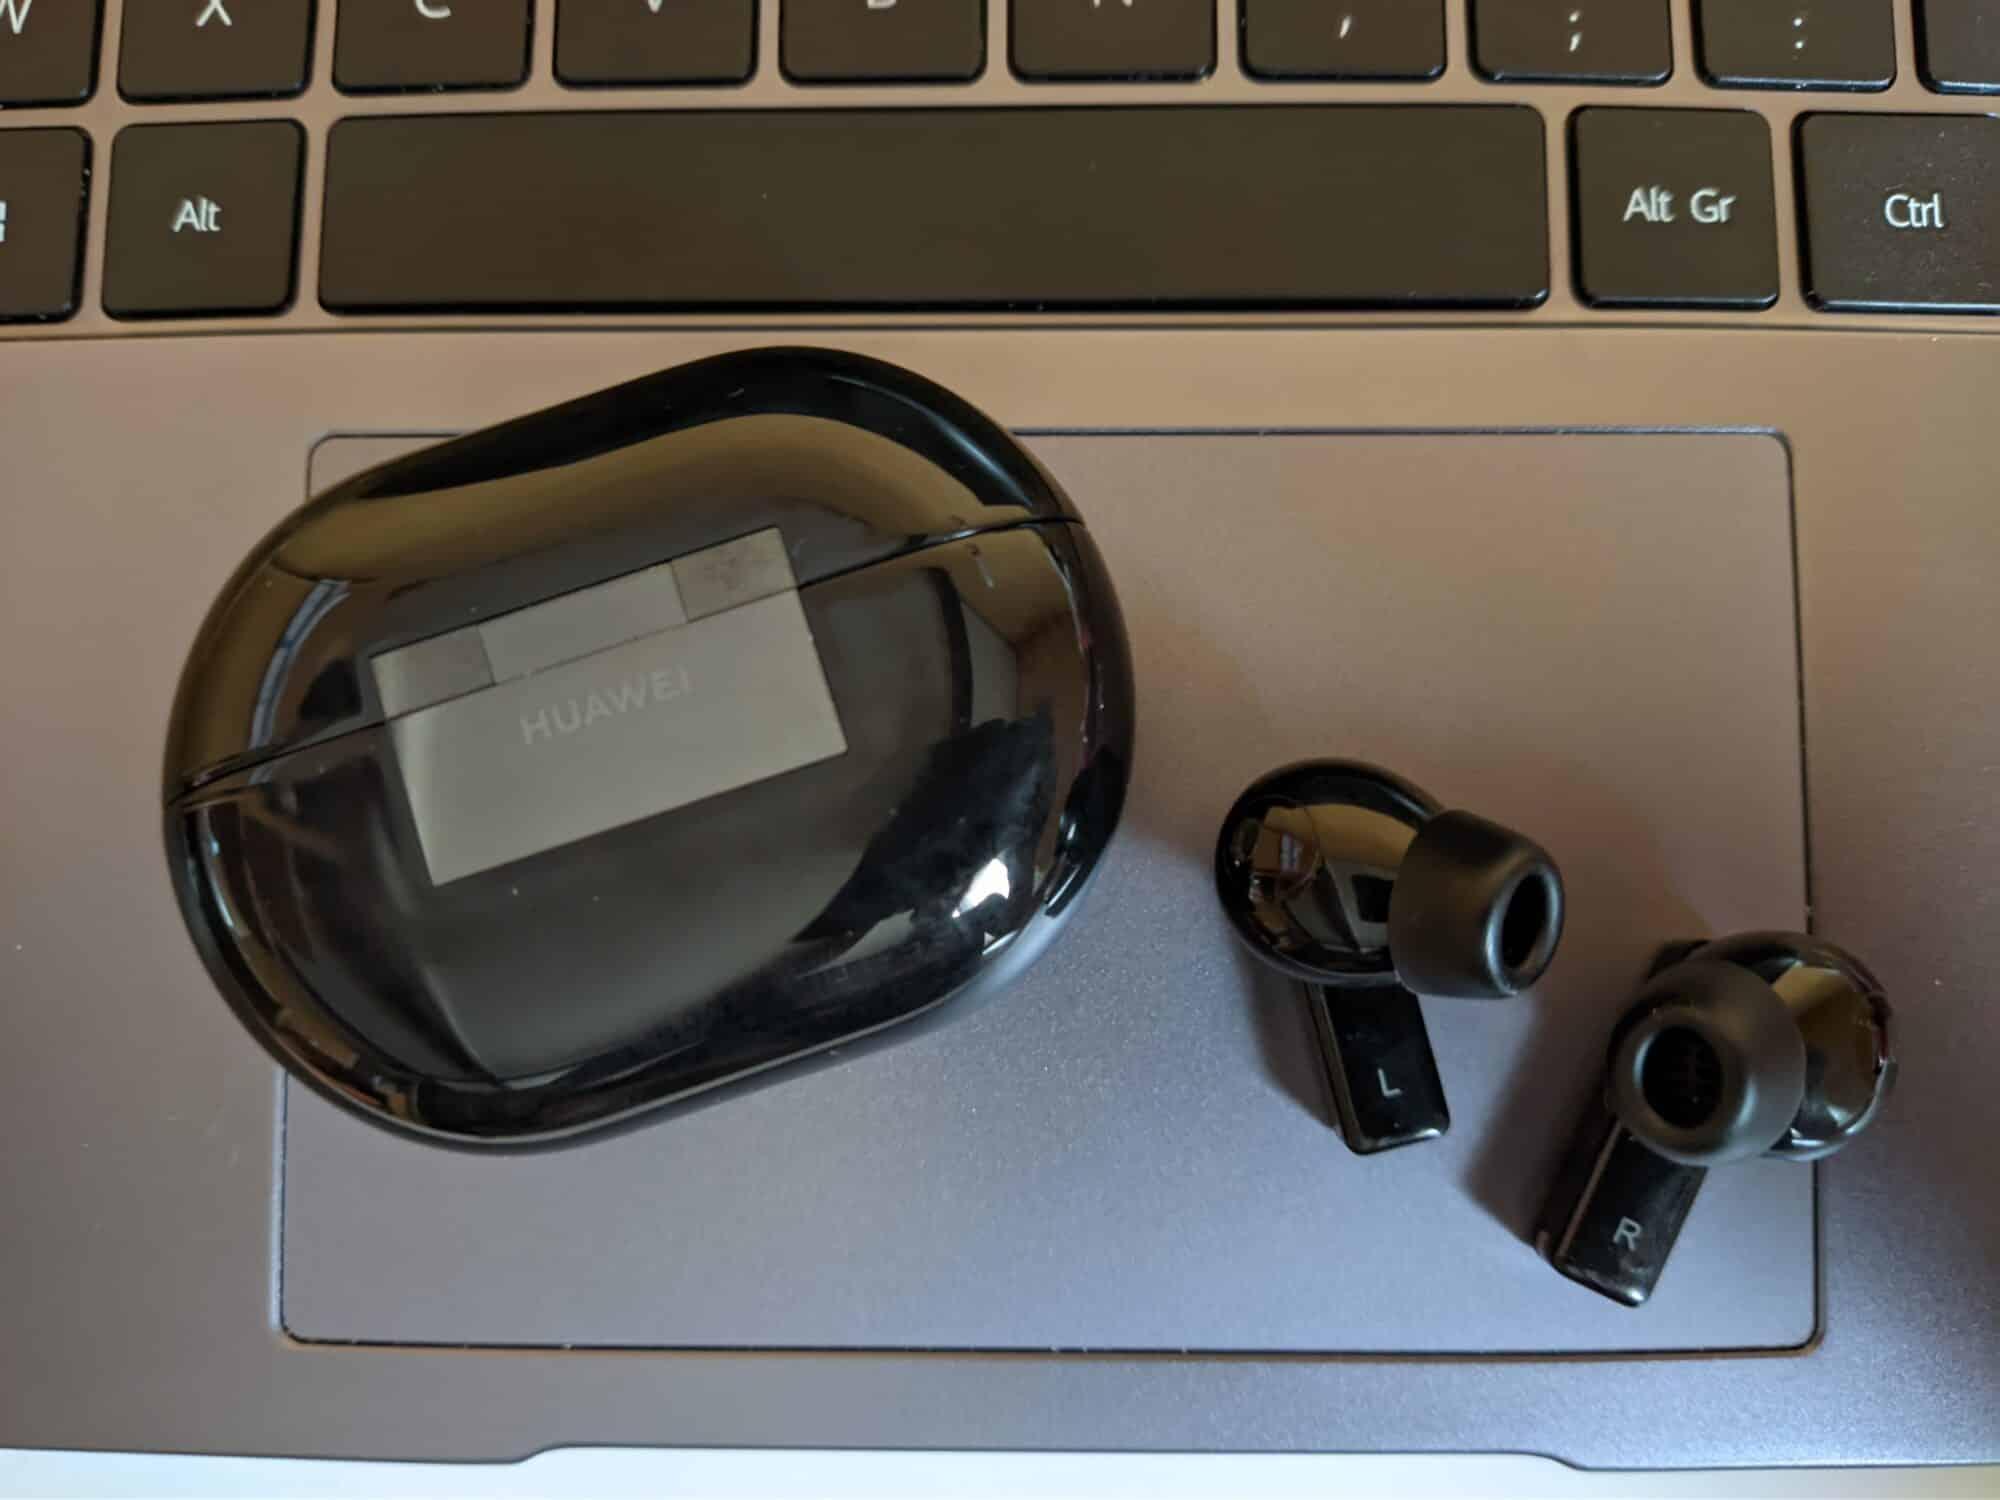 Huawei FreeBuds Pro Ai Life écouteurs bluetooth true wireless application mouvements interaction réduction bruit volume design